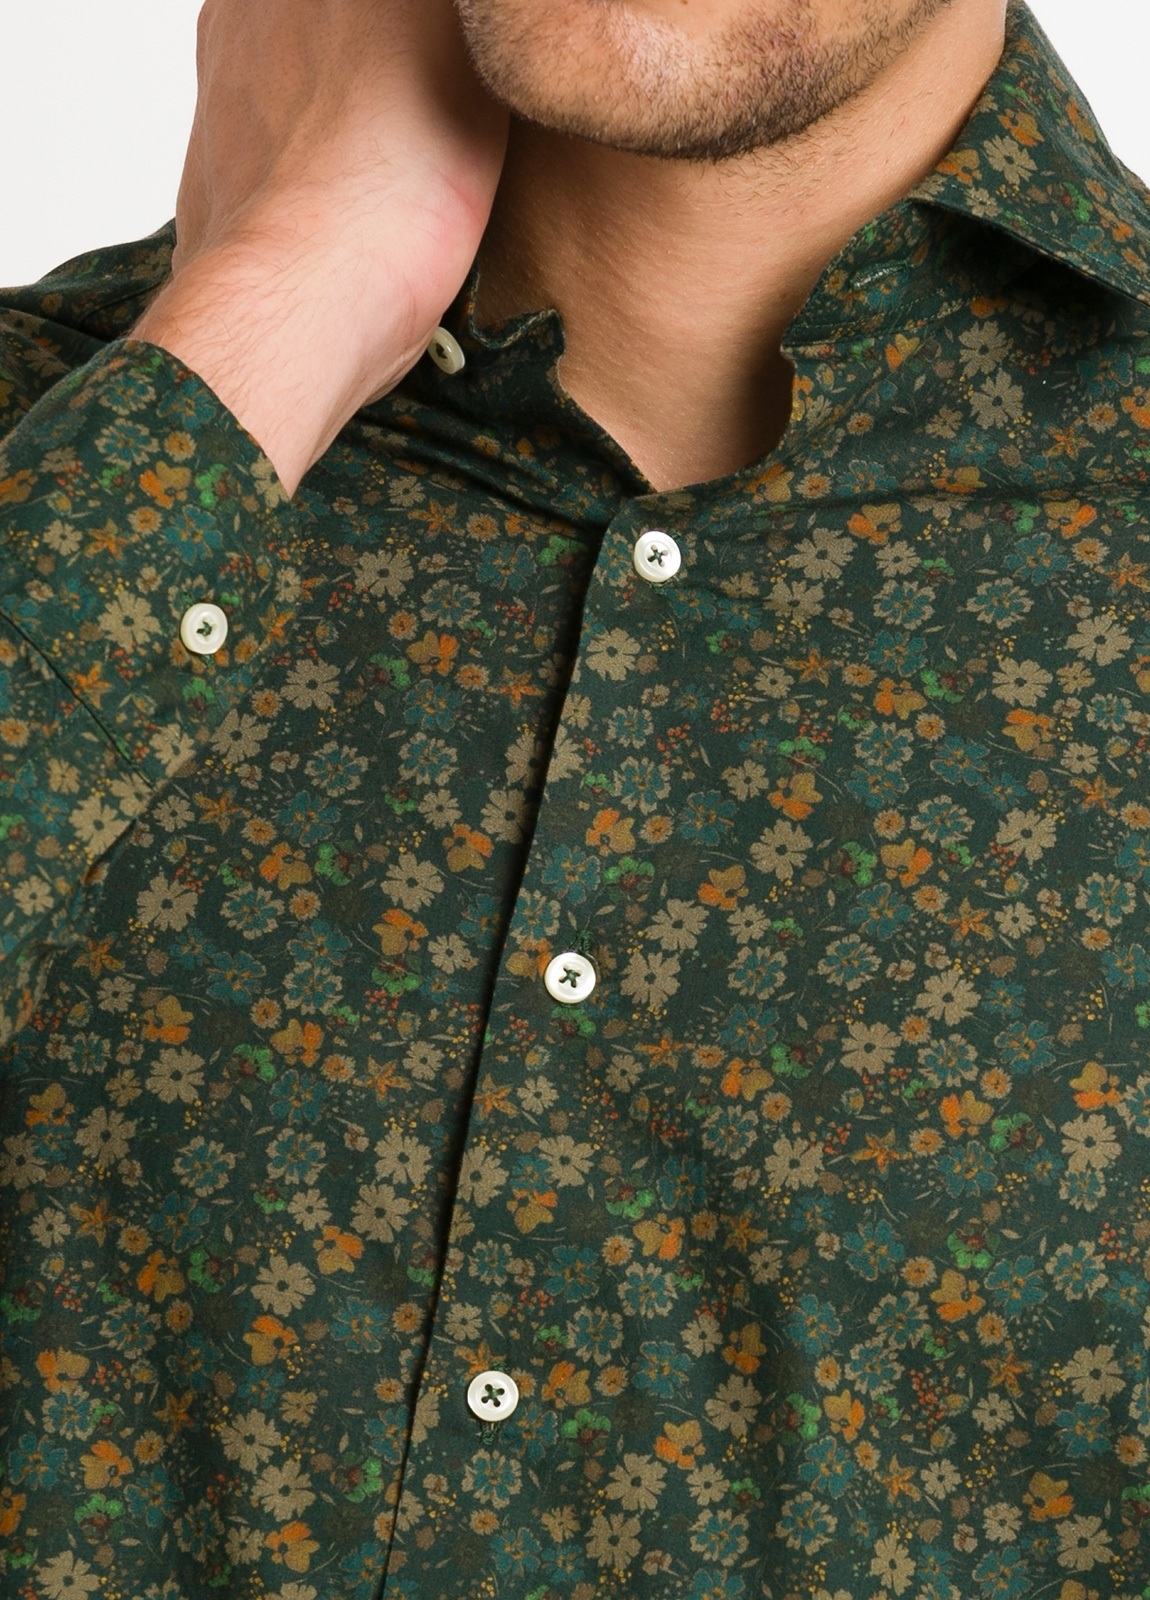 Camisa Leisure Wear SLIM FIT modelo PORTO estampado flores color verde. 100% Algodón. - Ítem2